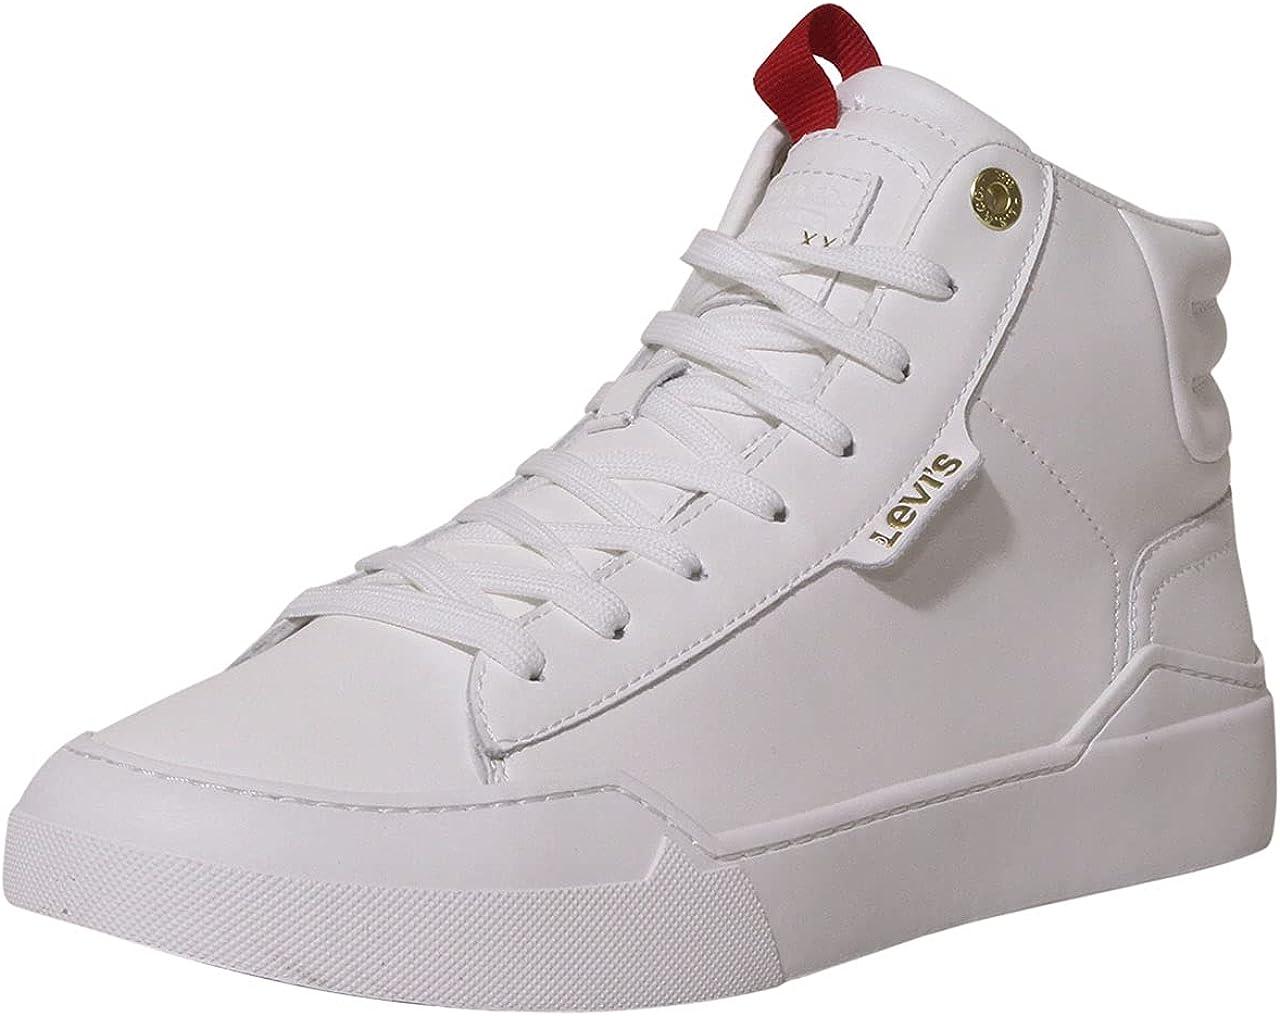 Levi's Mens 521 XX Est Hightop Max 68% OFF Sneaker latest LE Hi Shoe